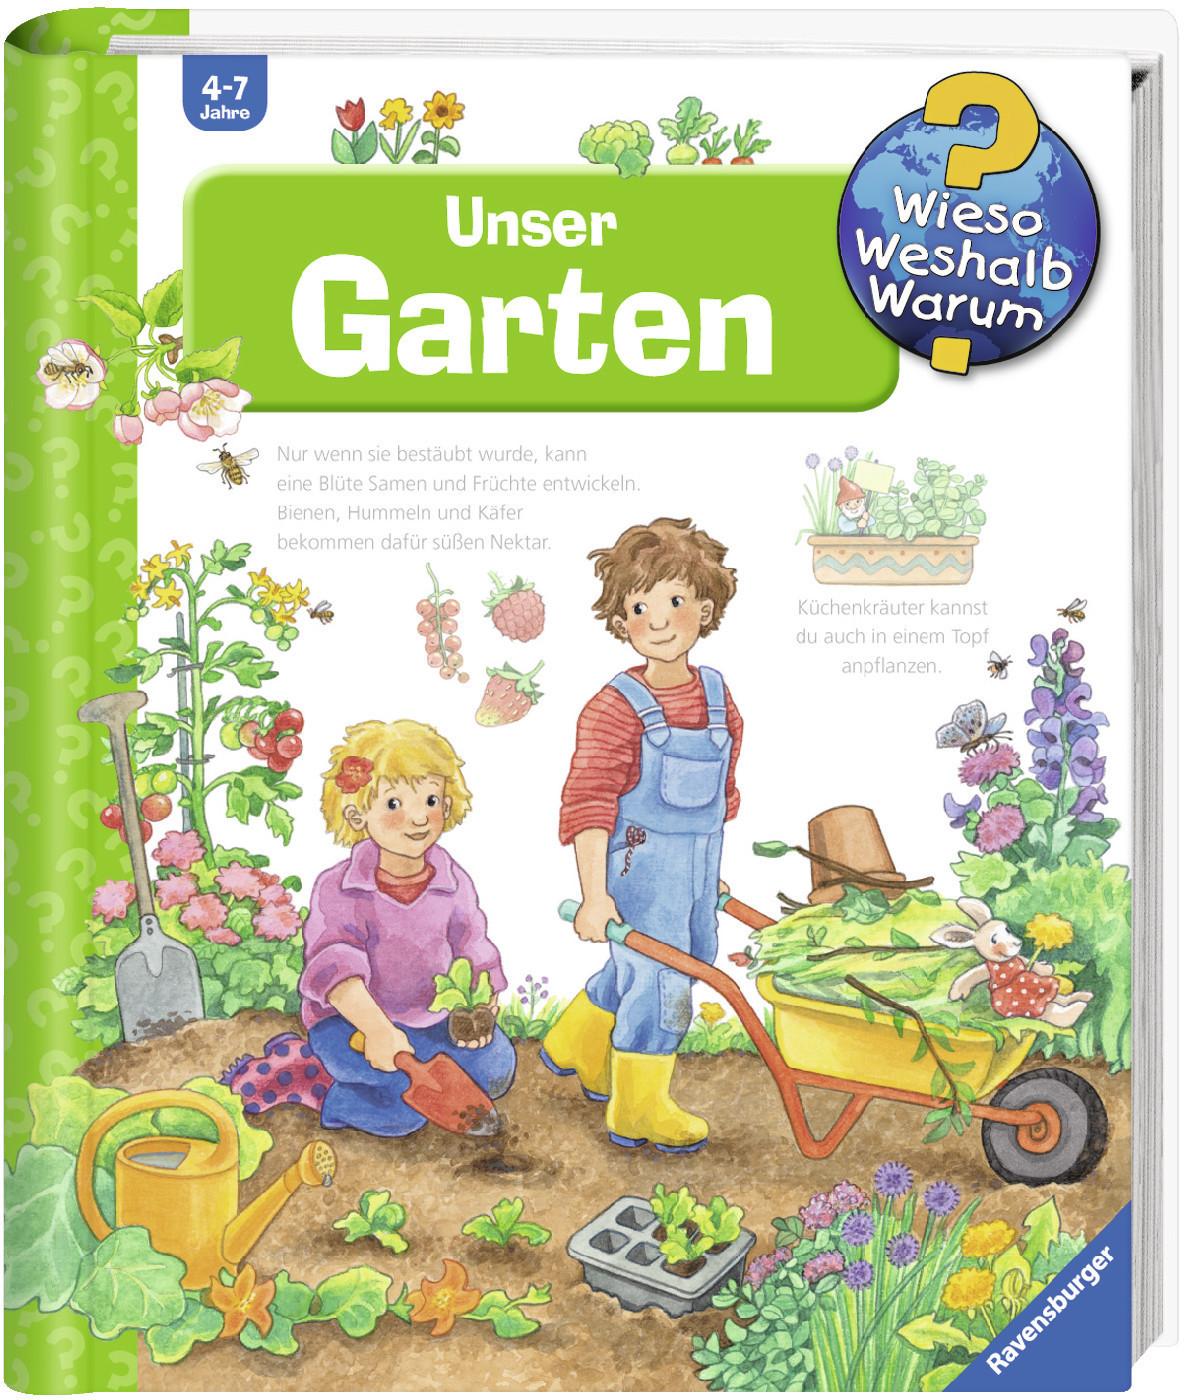 #Wieso? Weshalb? Warum? – Unser Garten Bd.43 (Eberhard, Irmgard / Erne, Andrea) [Spiralbindung]#